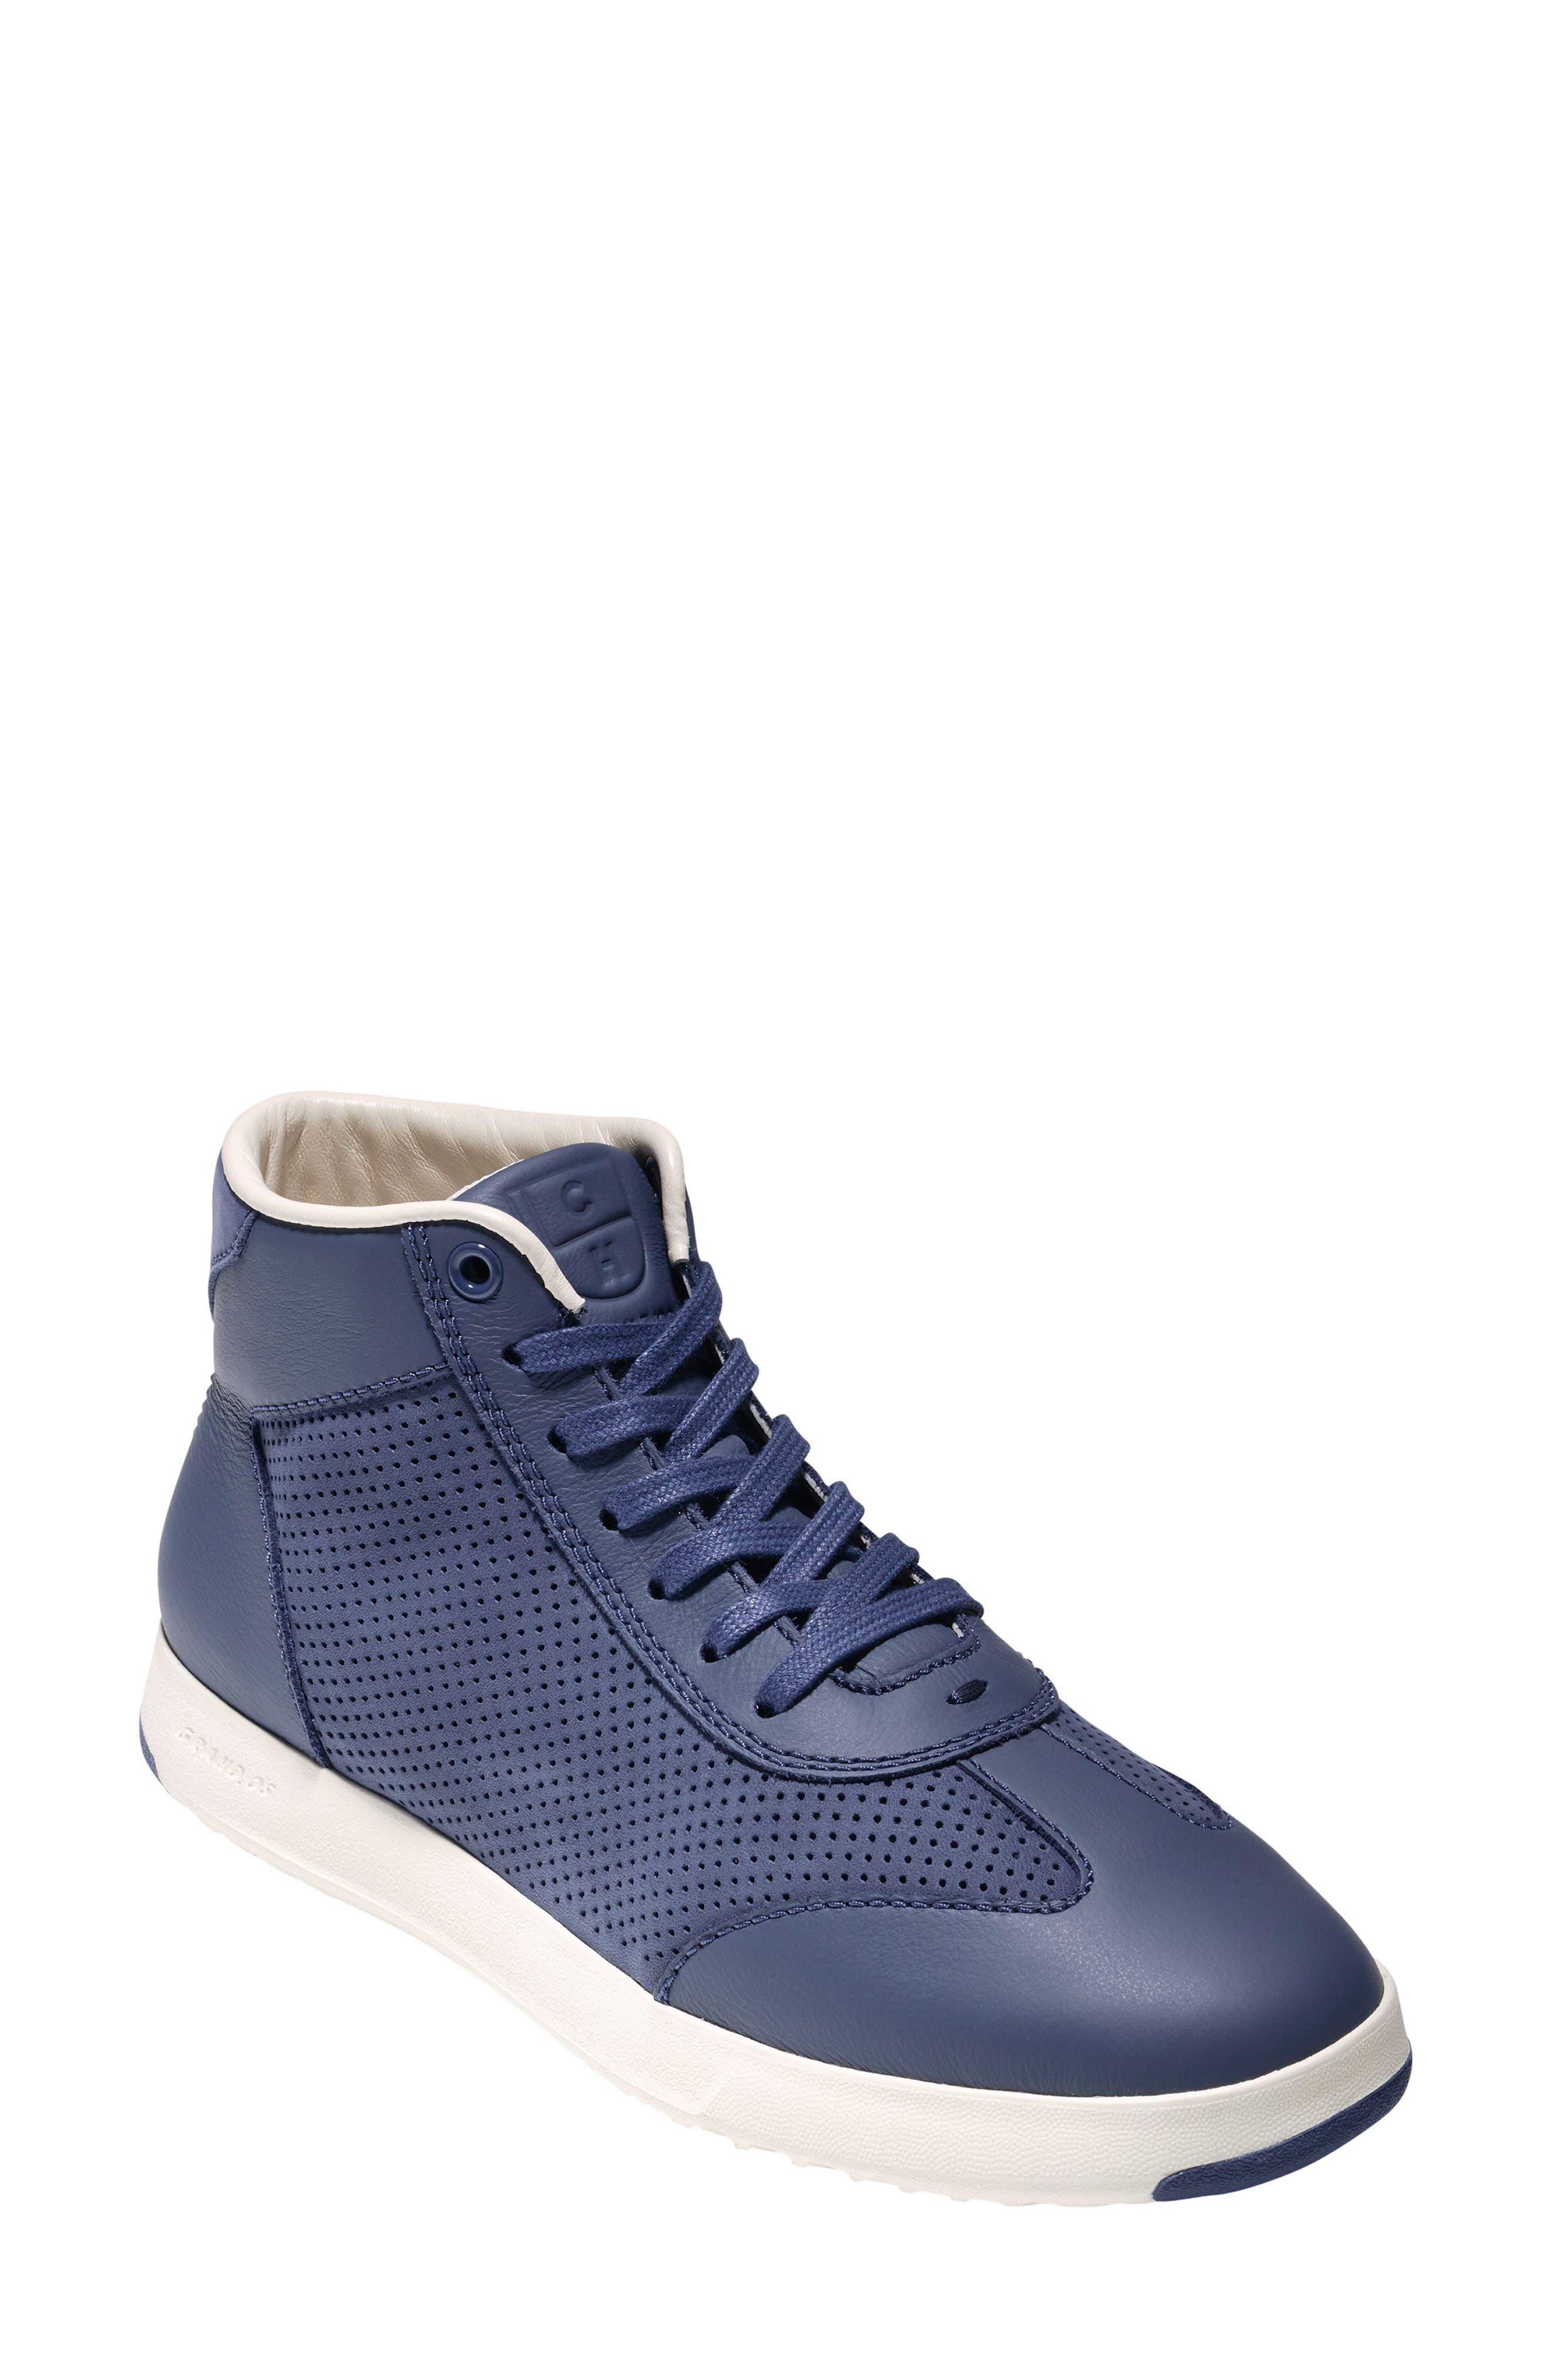 GrandPro High Top Sneaker,                             Main thumbnail 3, color,